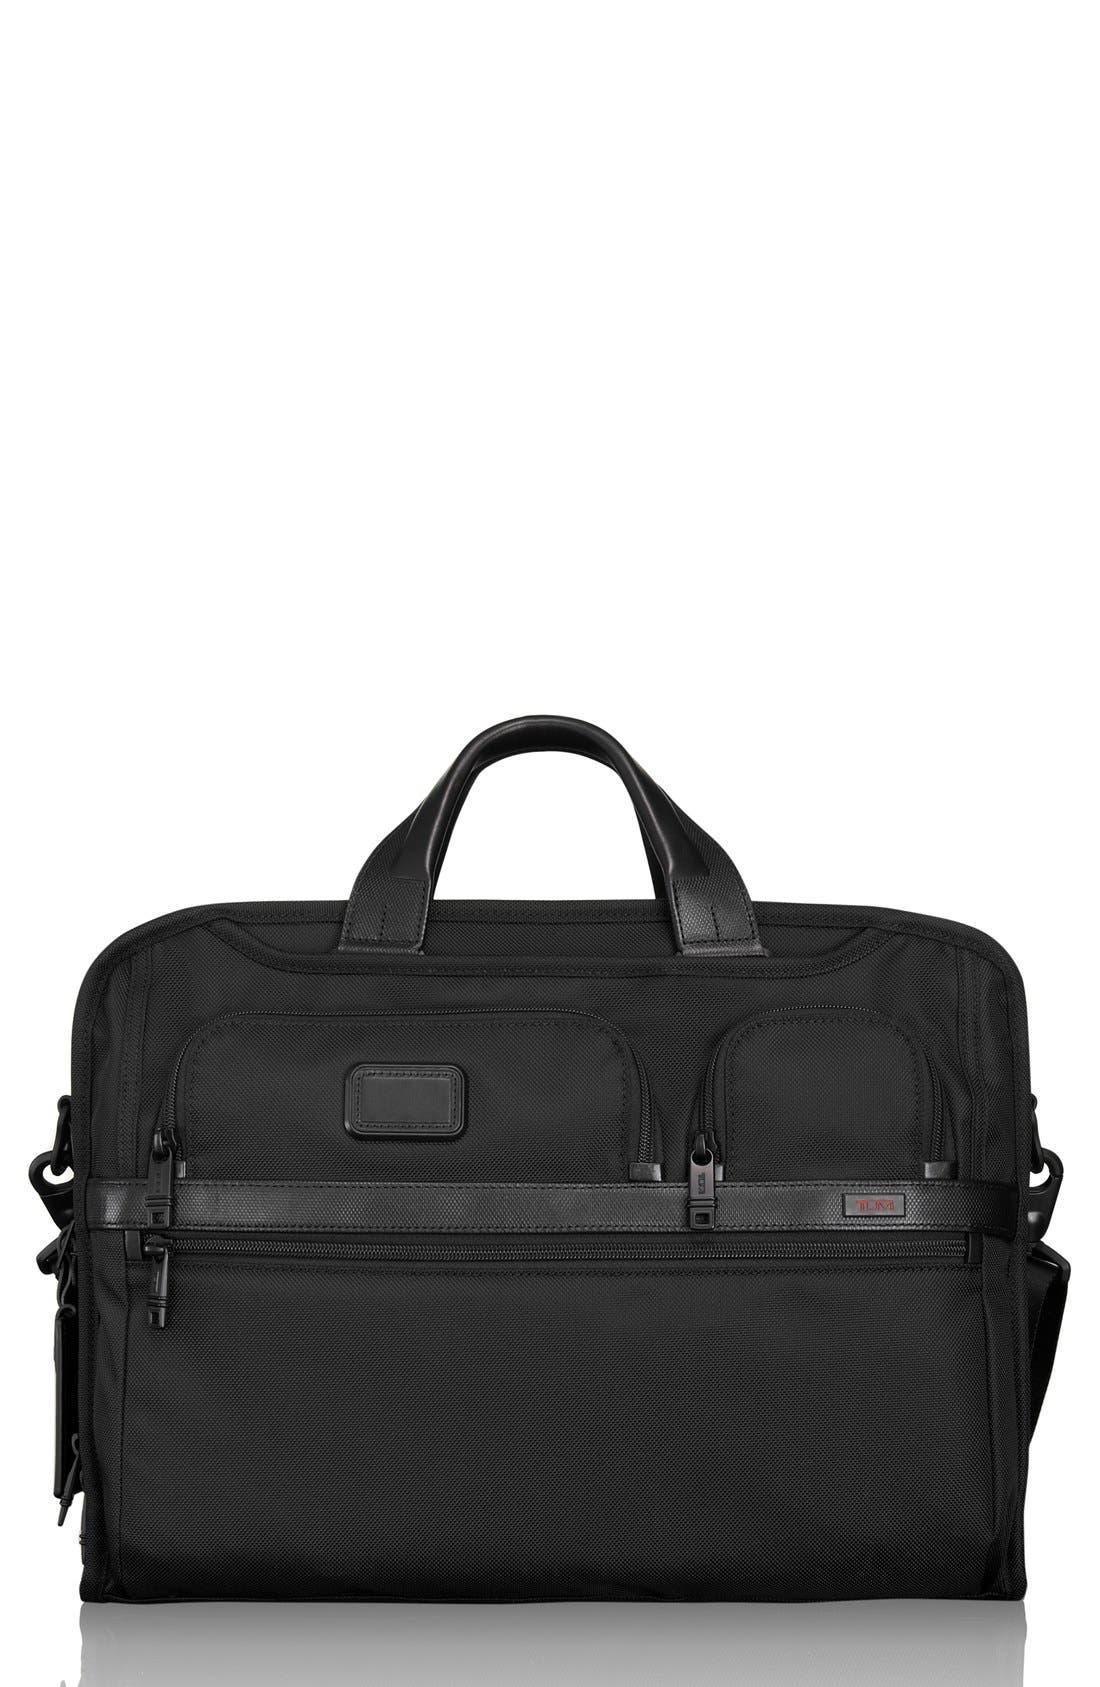 Alpha 2 Laptop Briefcase with Tumi ID Lock Pocket,                         Main,                         color, BLACK